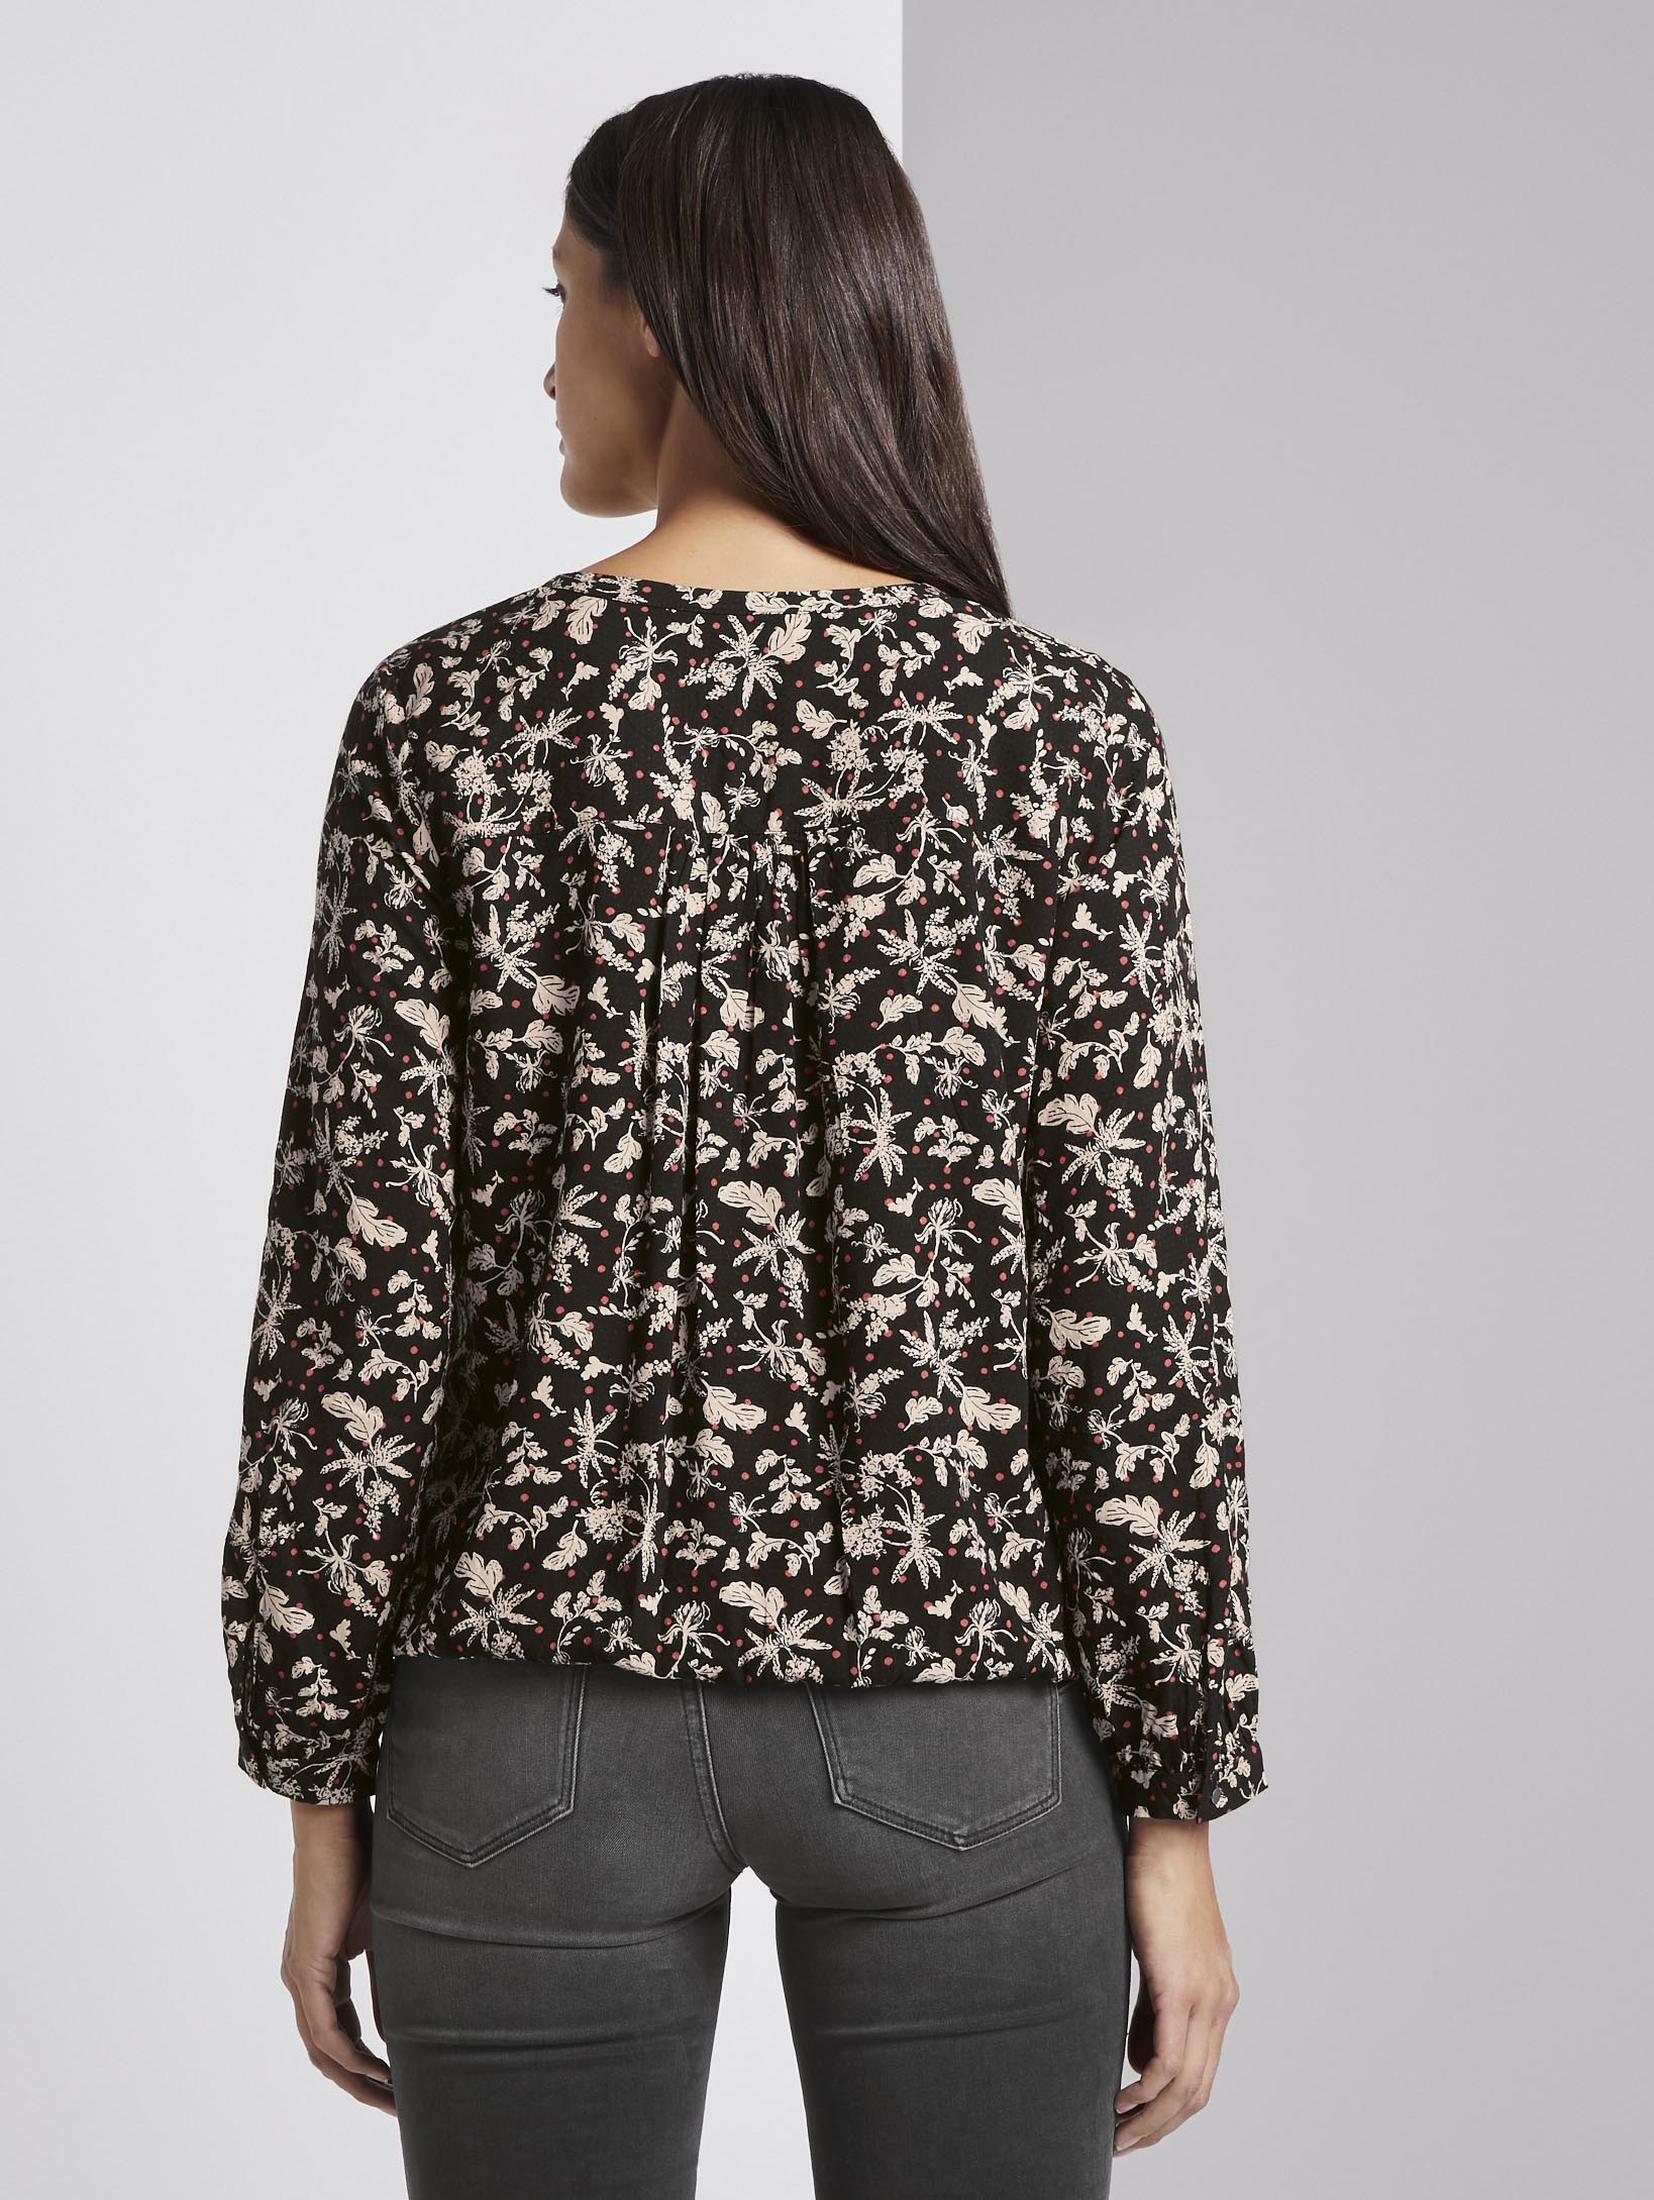 TOM TAILOR Shirtbluse Gemusterte Bluse mit Allover-Print